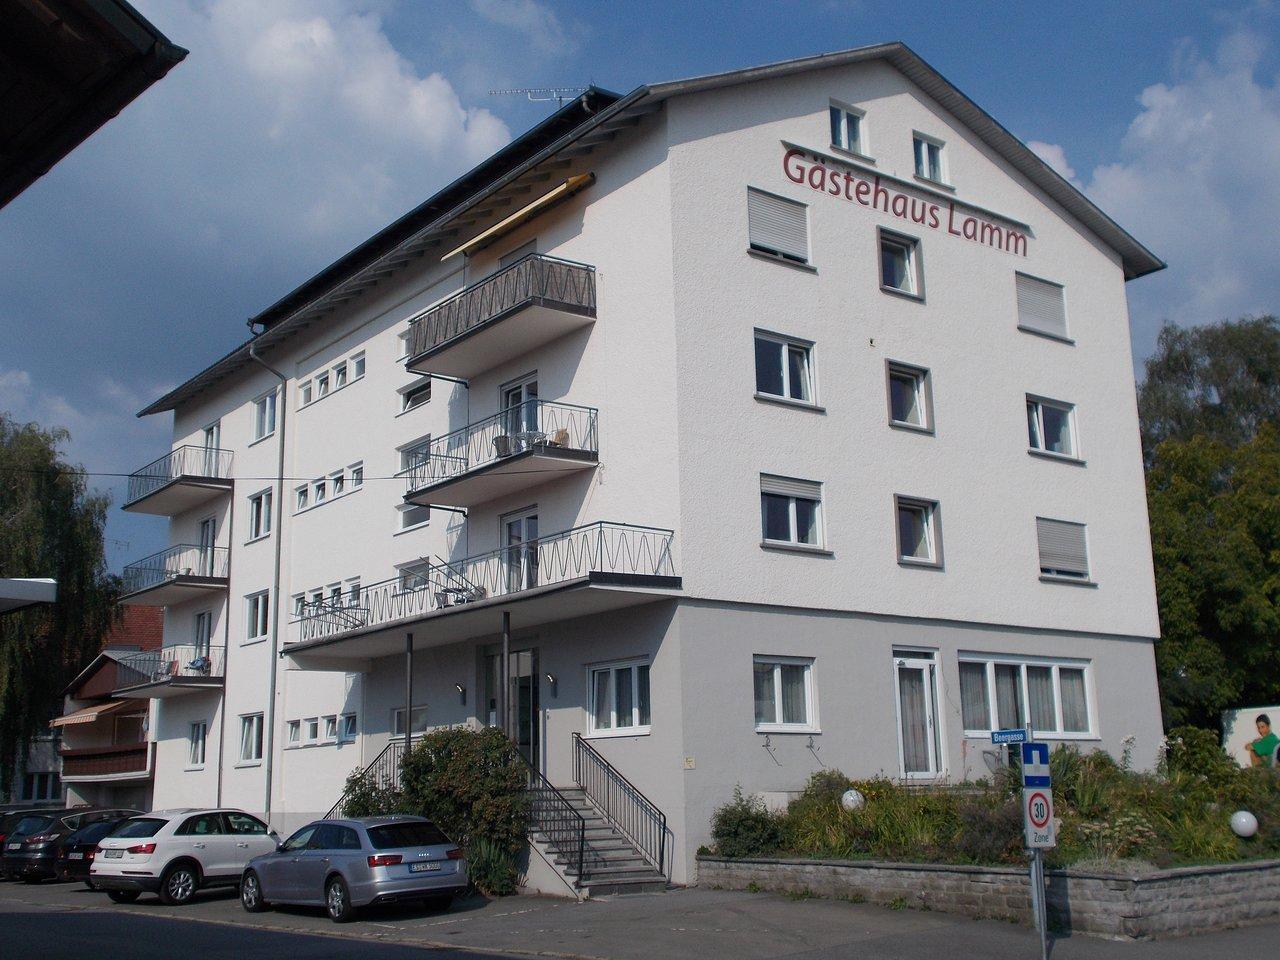 Gasthof Hotel Lamm 129 1 9 2 Prices Inn Reviews